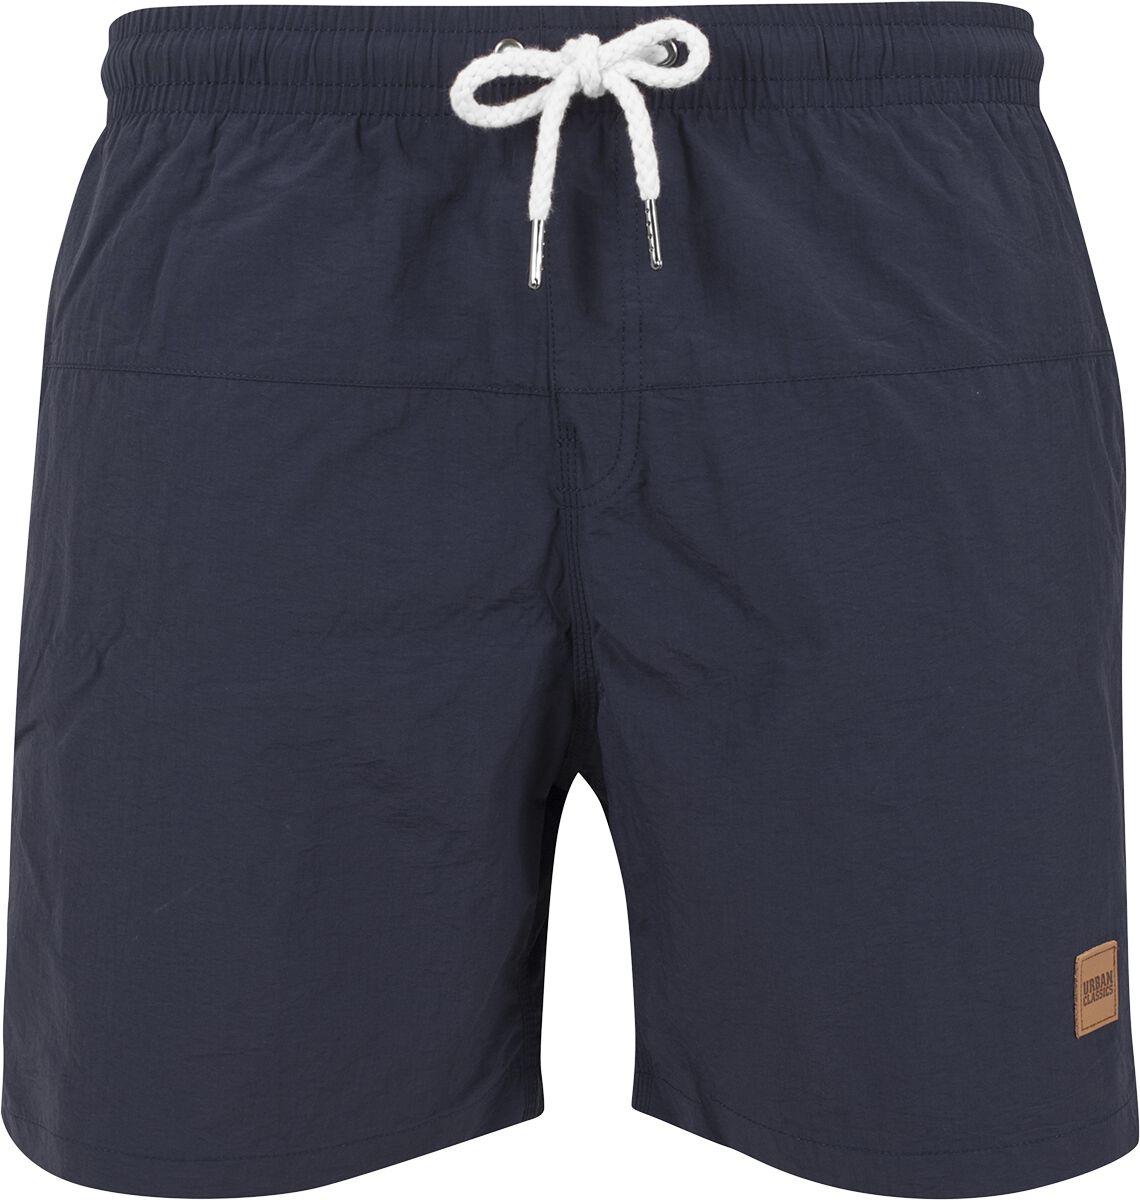 Image of   Urban Classics Block Swim Shorts Badeshorts navy